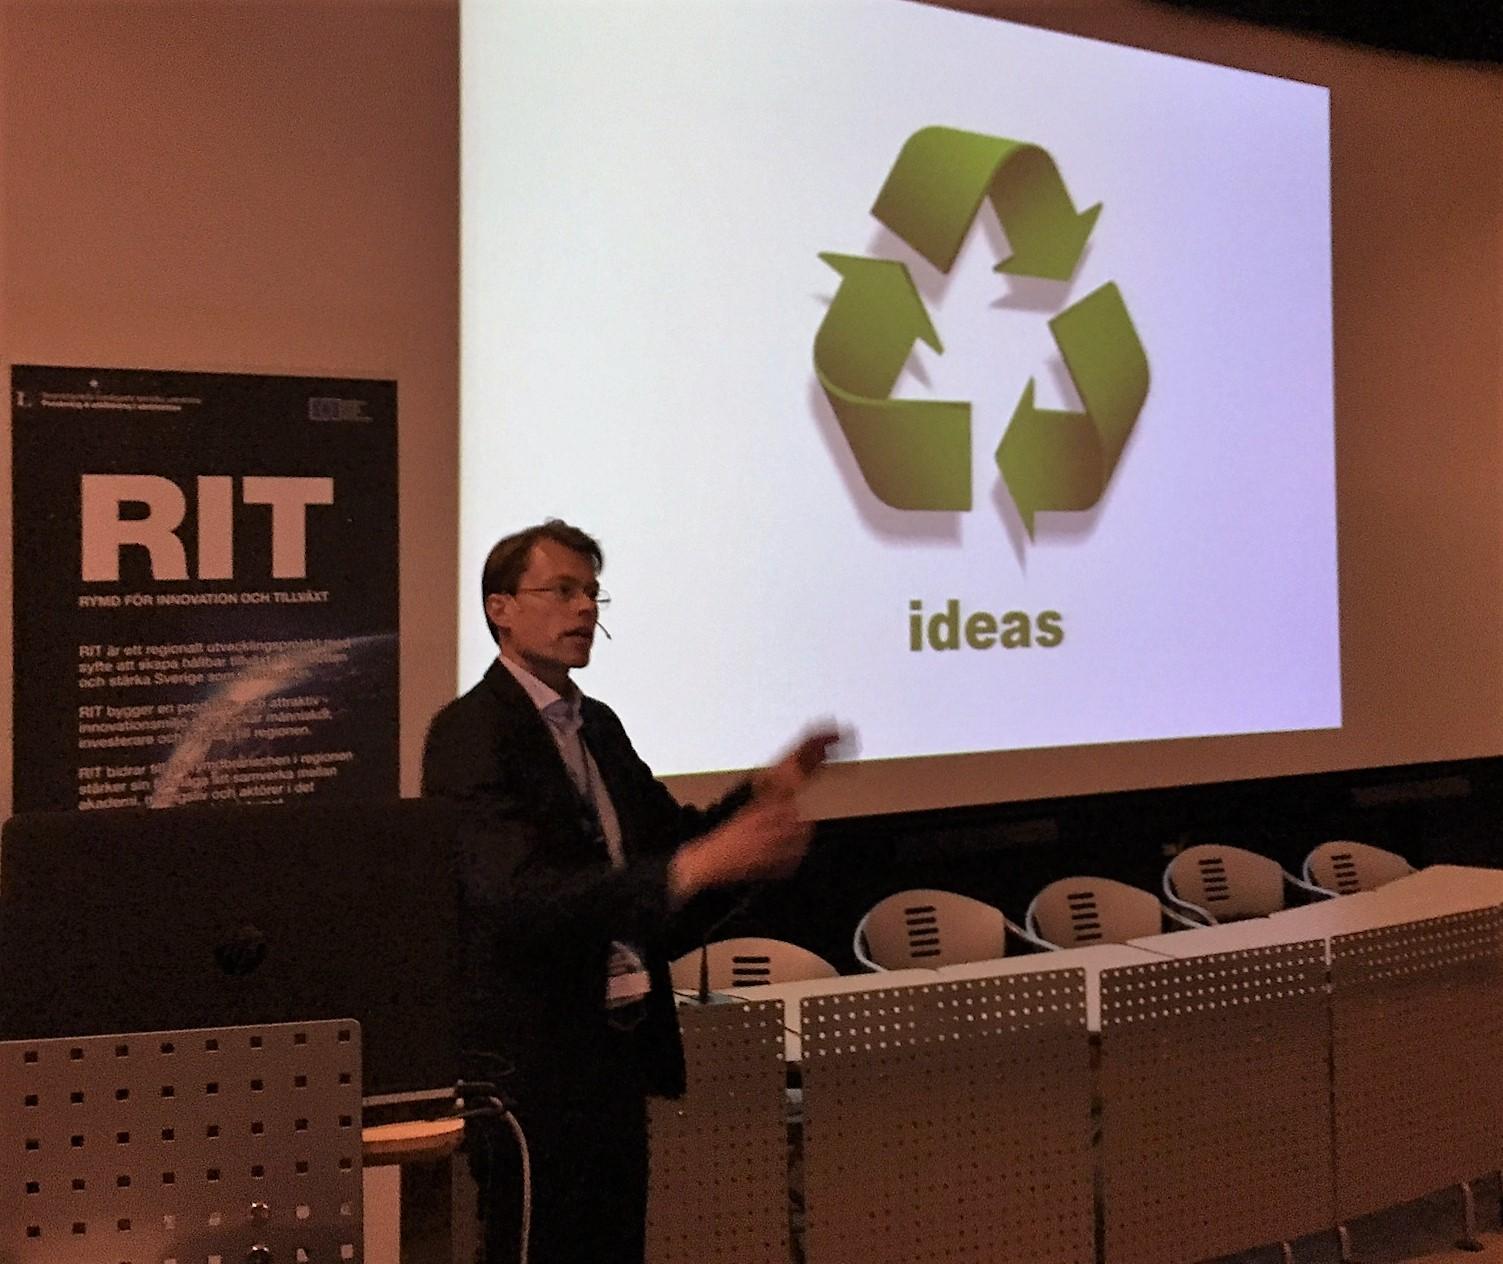 Stefan Gustafsson, ESA Technology Transfer Office, talks about the ESA Eco System